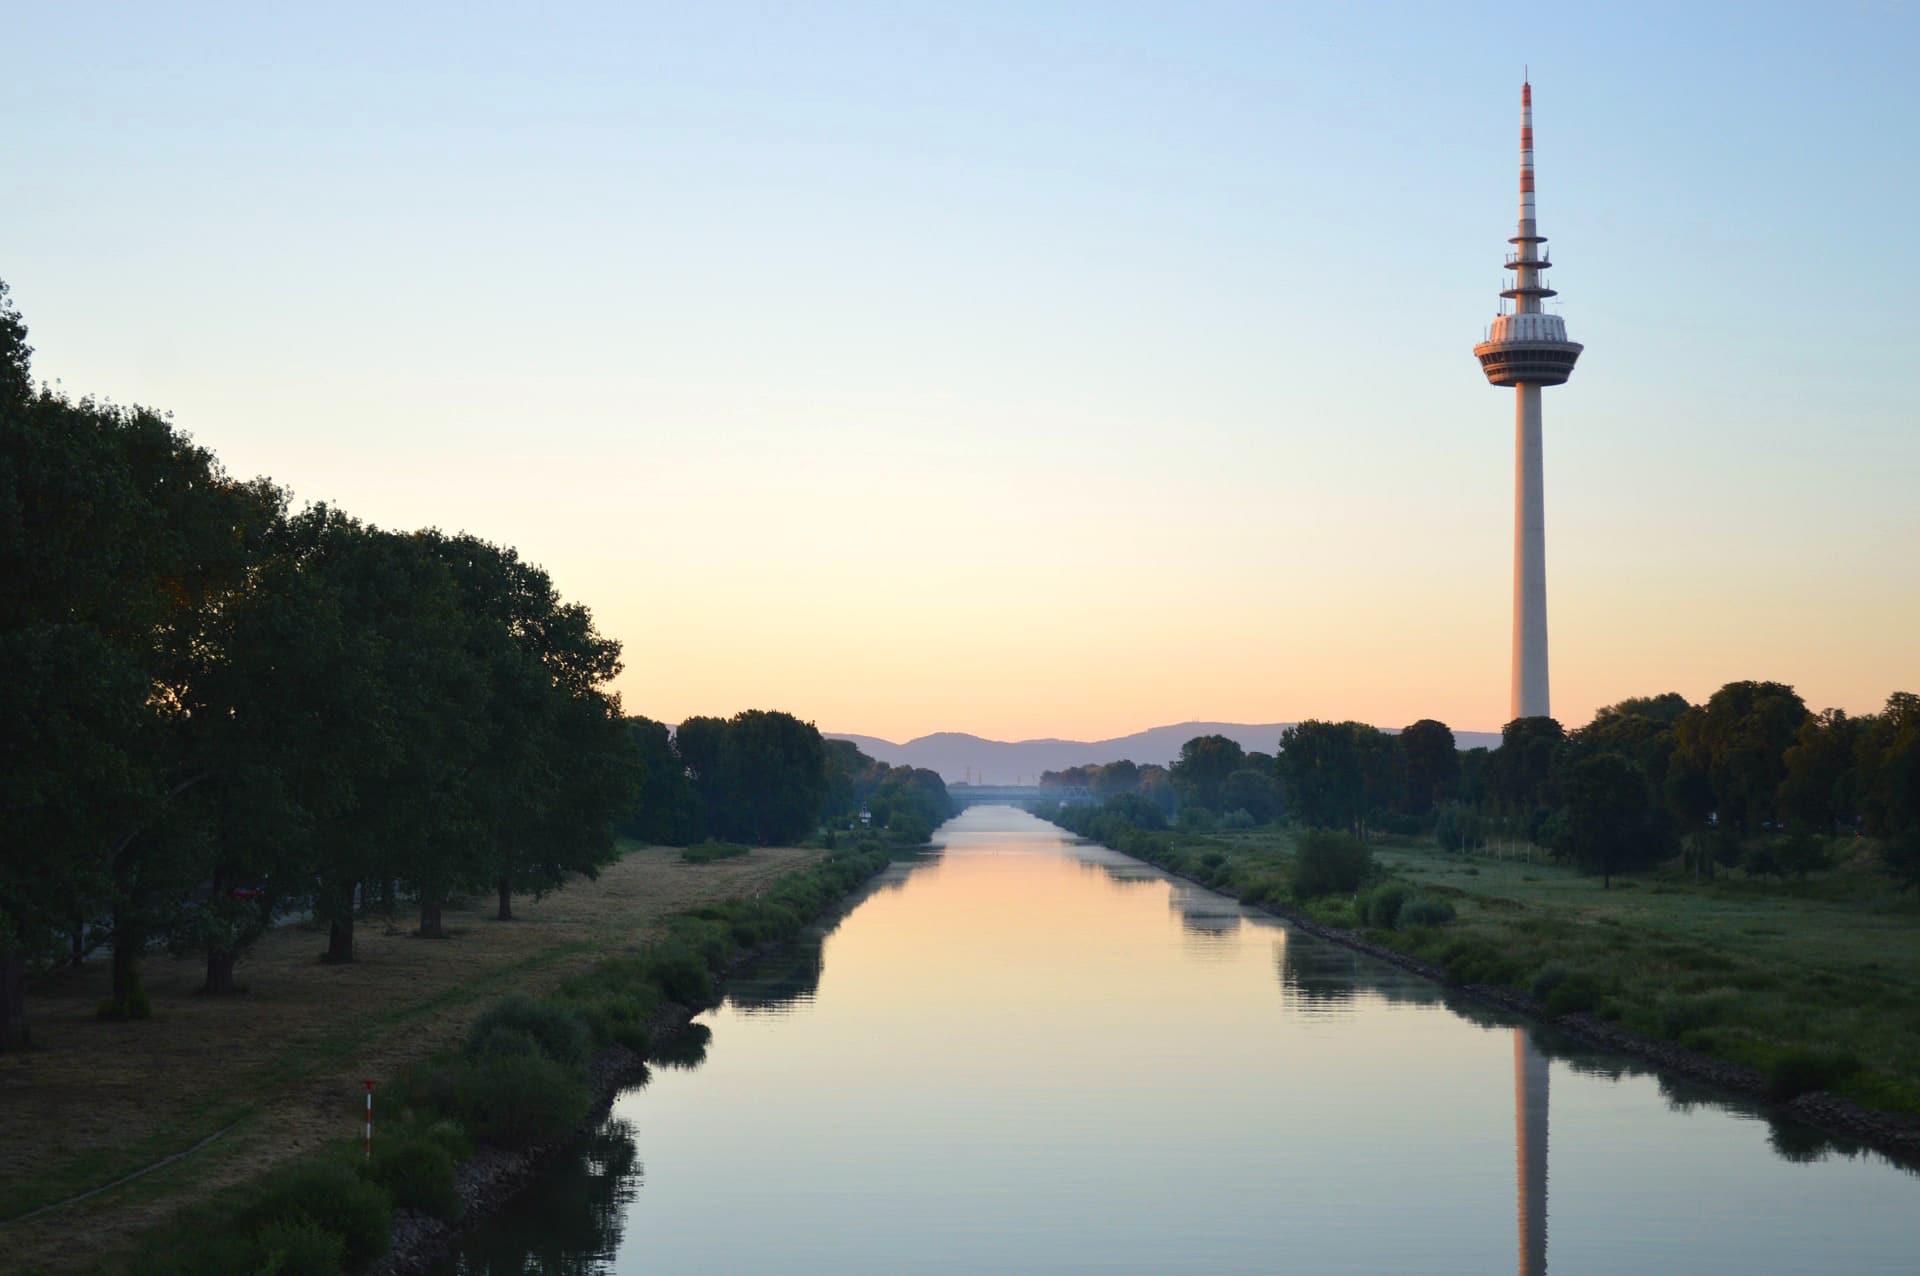 blogger rhein neckar region - Blogger in der Region Rhein-Neckar